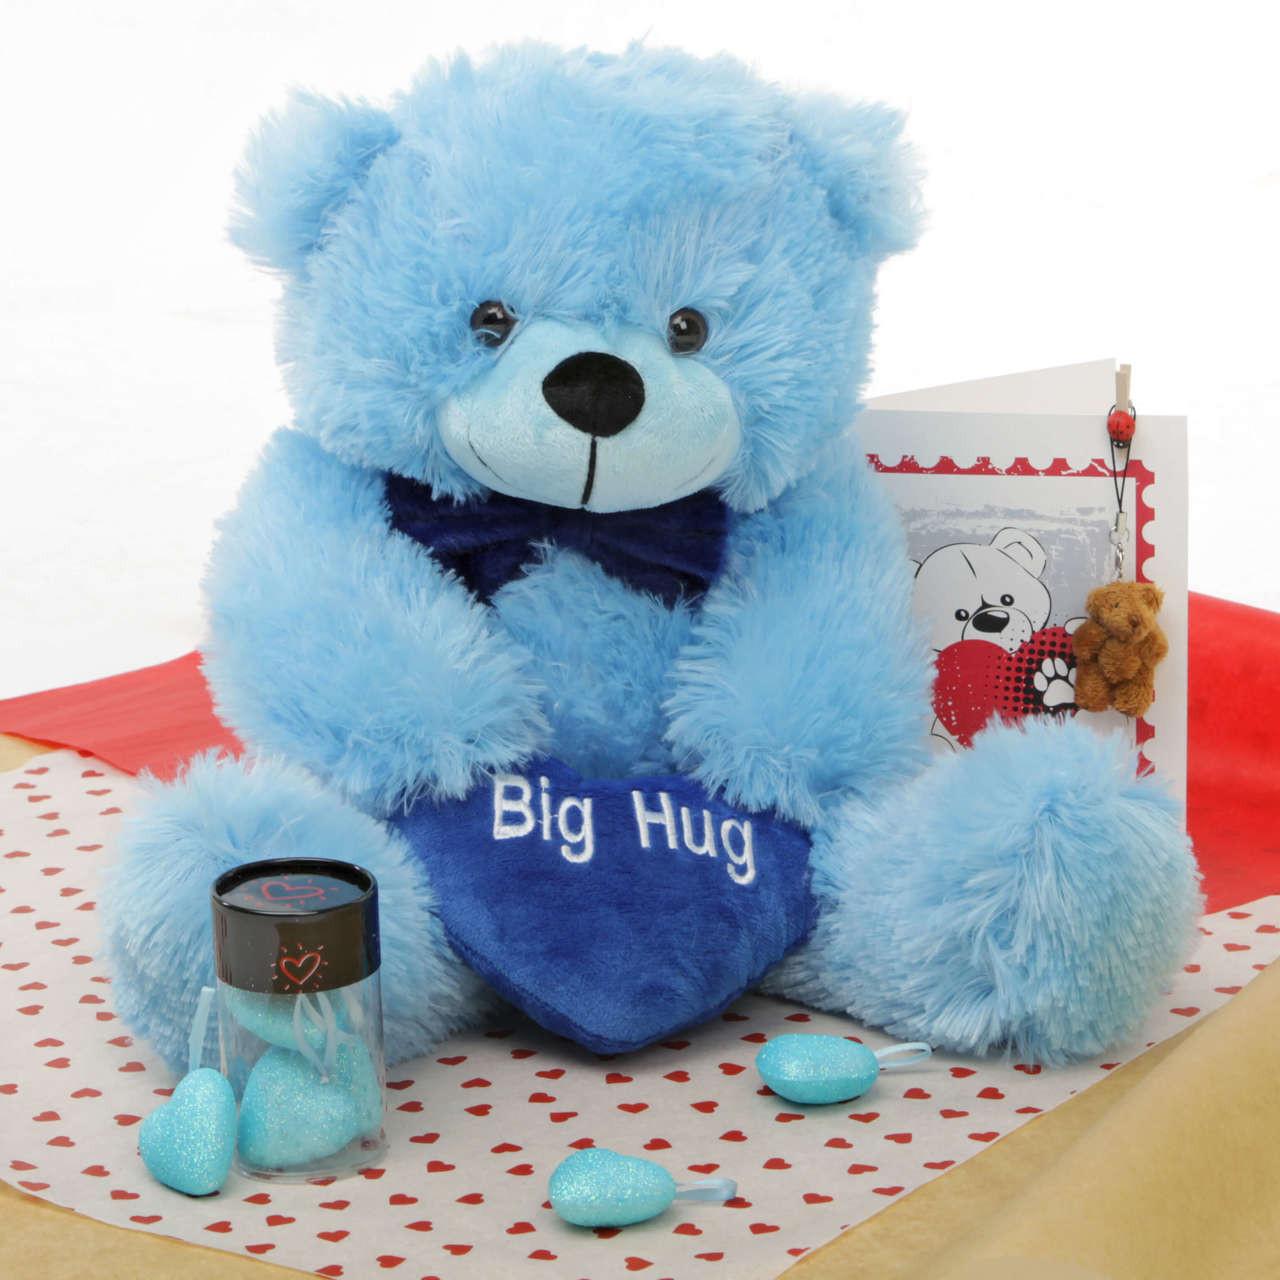 He Loves Me Blue Teddy Bear Hug Care Package 18in